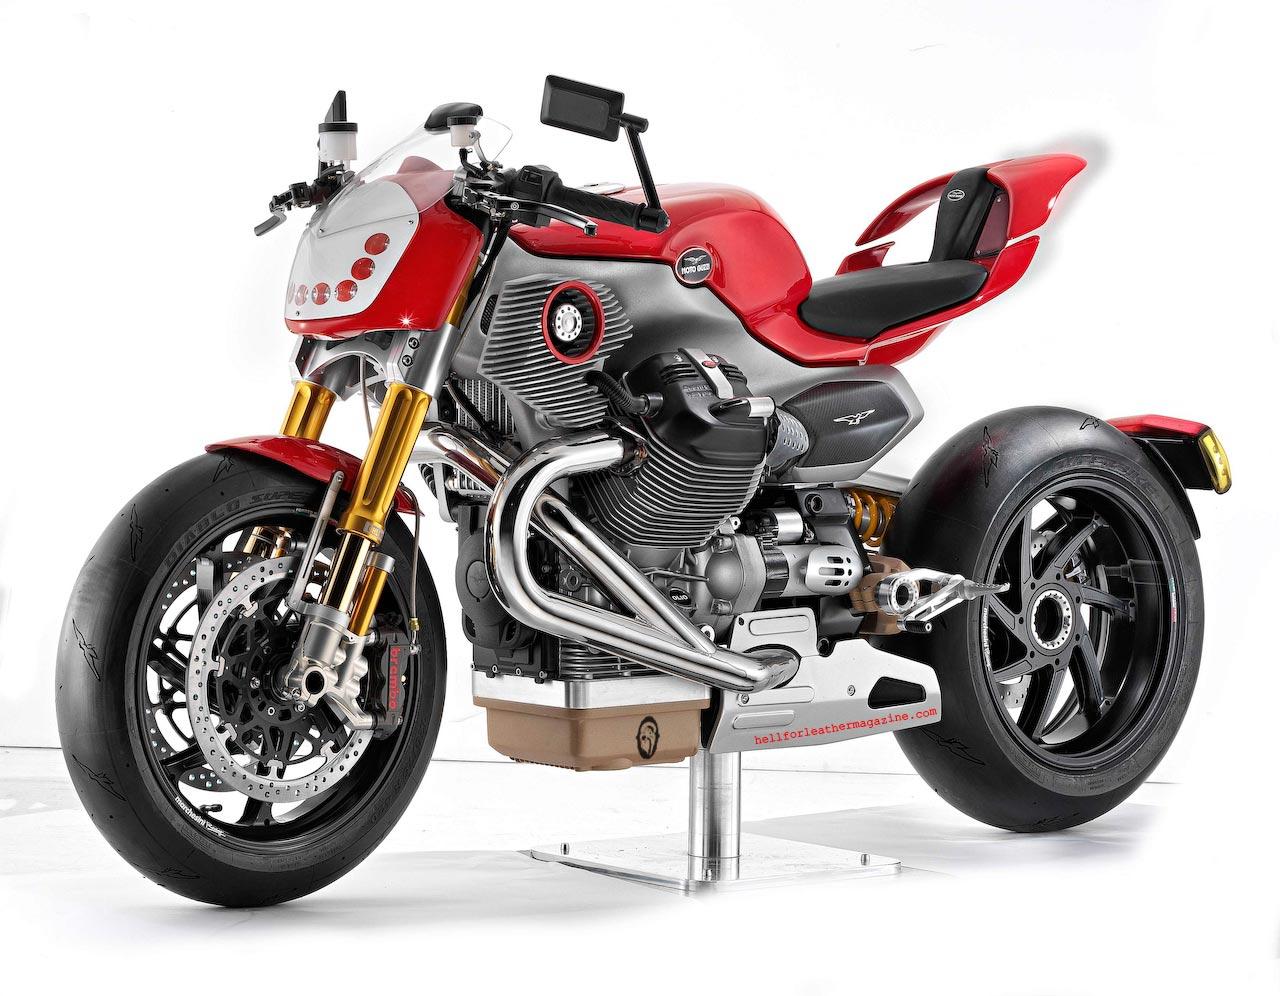 Moto Guzzi V12 LeMans Pierre Terblanche